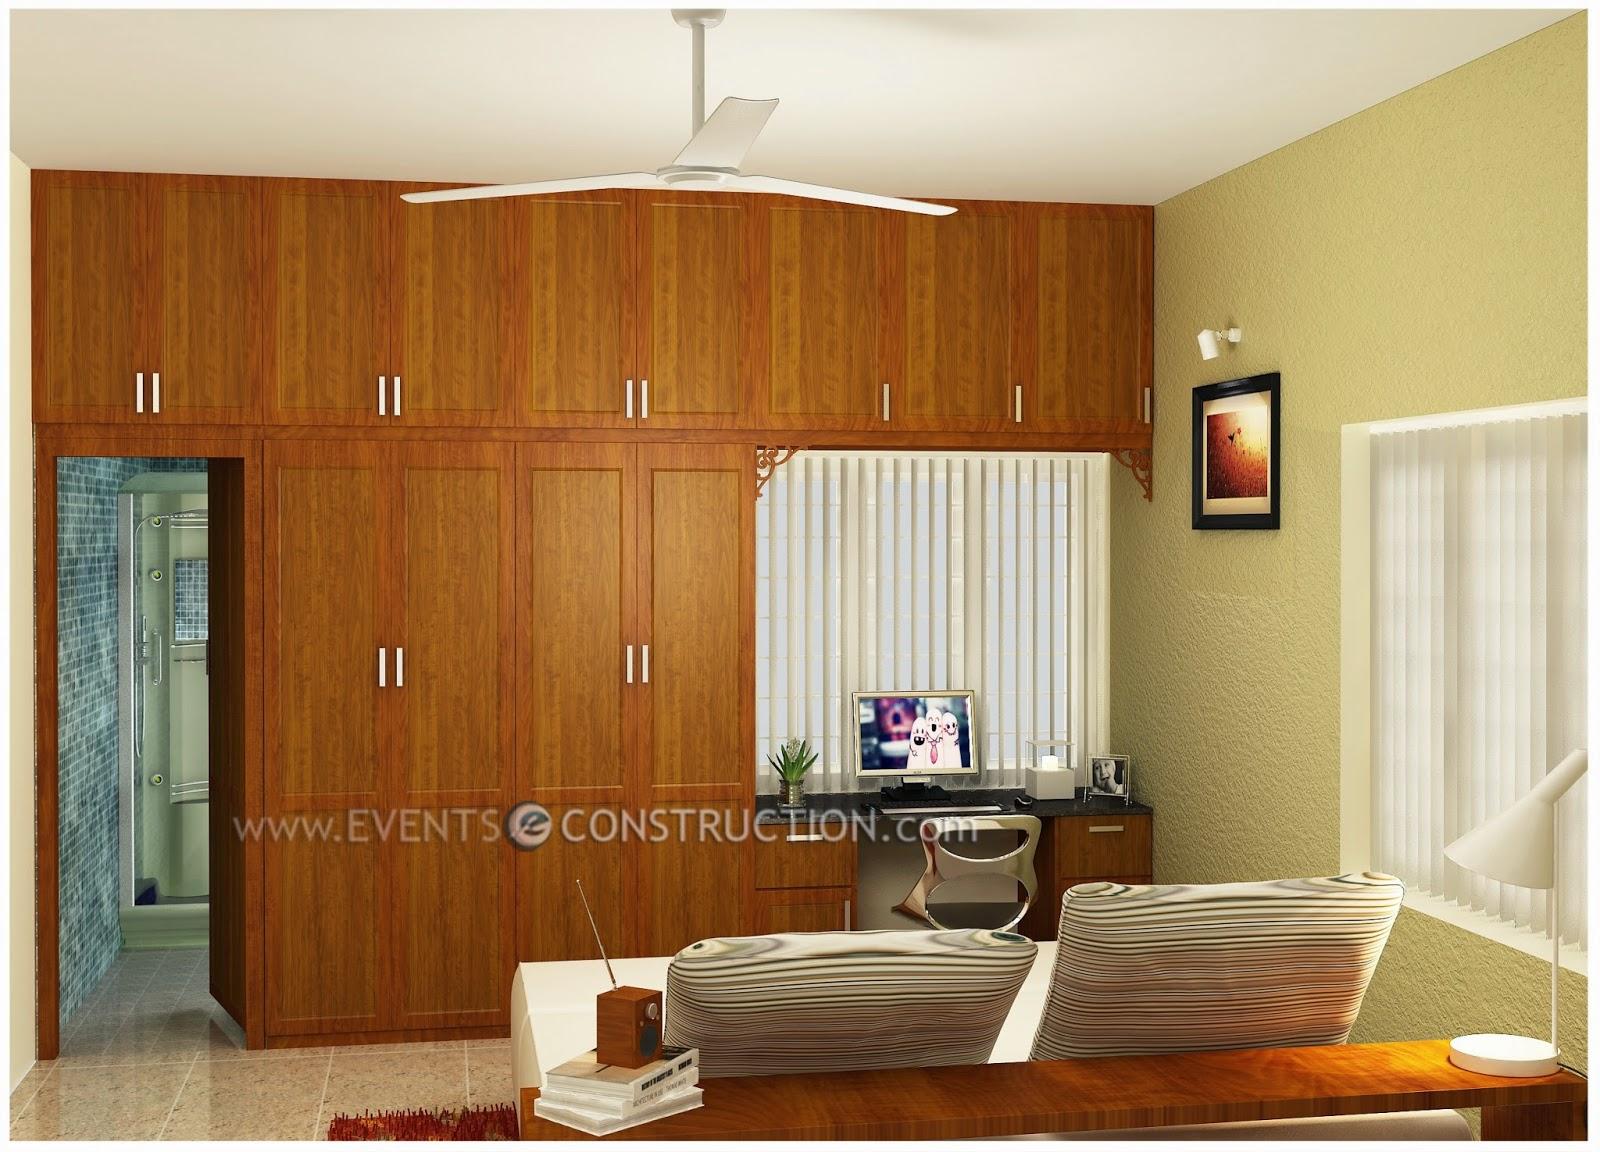 Evens construction pvt ltd bedroom interior design with - Wardrobe interior designs for bedroom ...